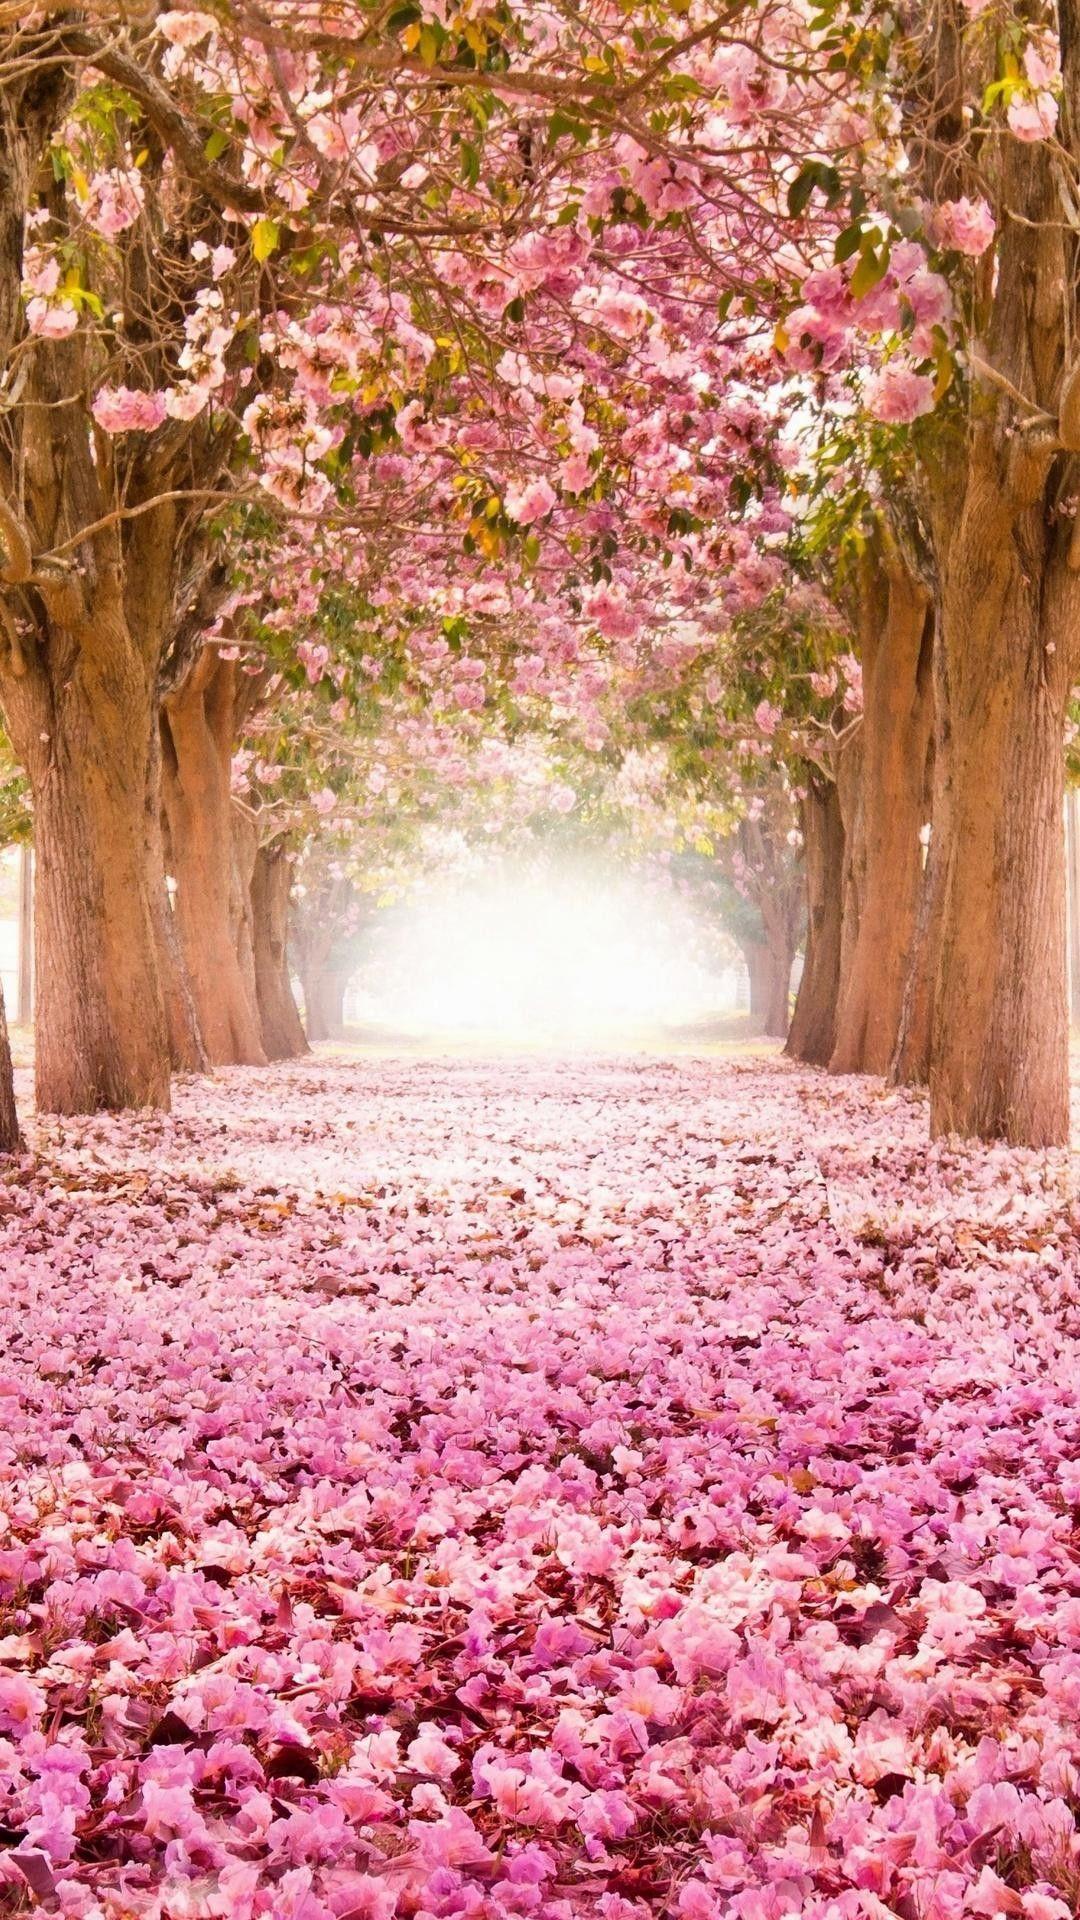 Mobile Iphone Flower Nature Wallpaper Wallpaper Hd